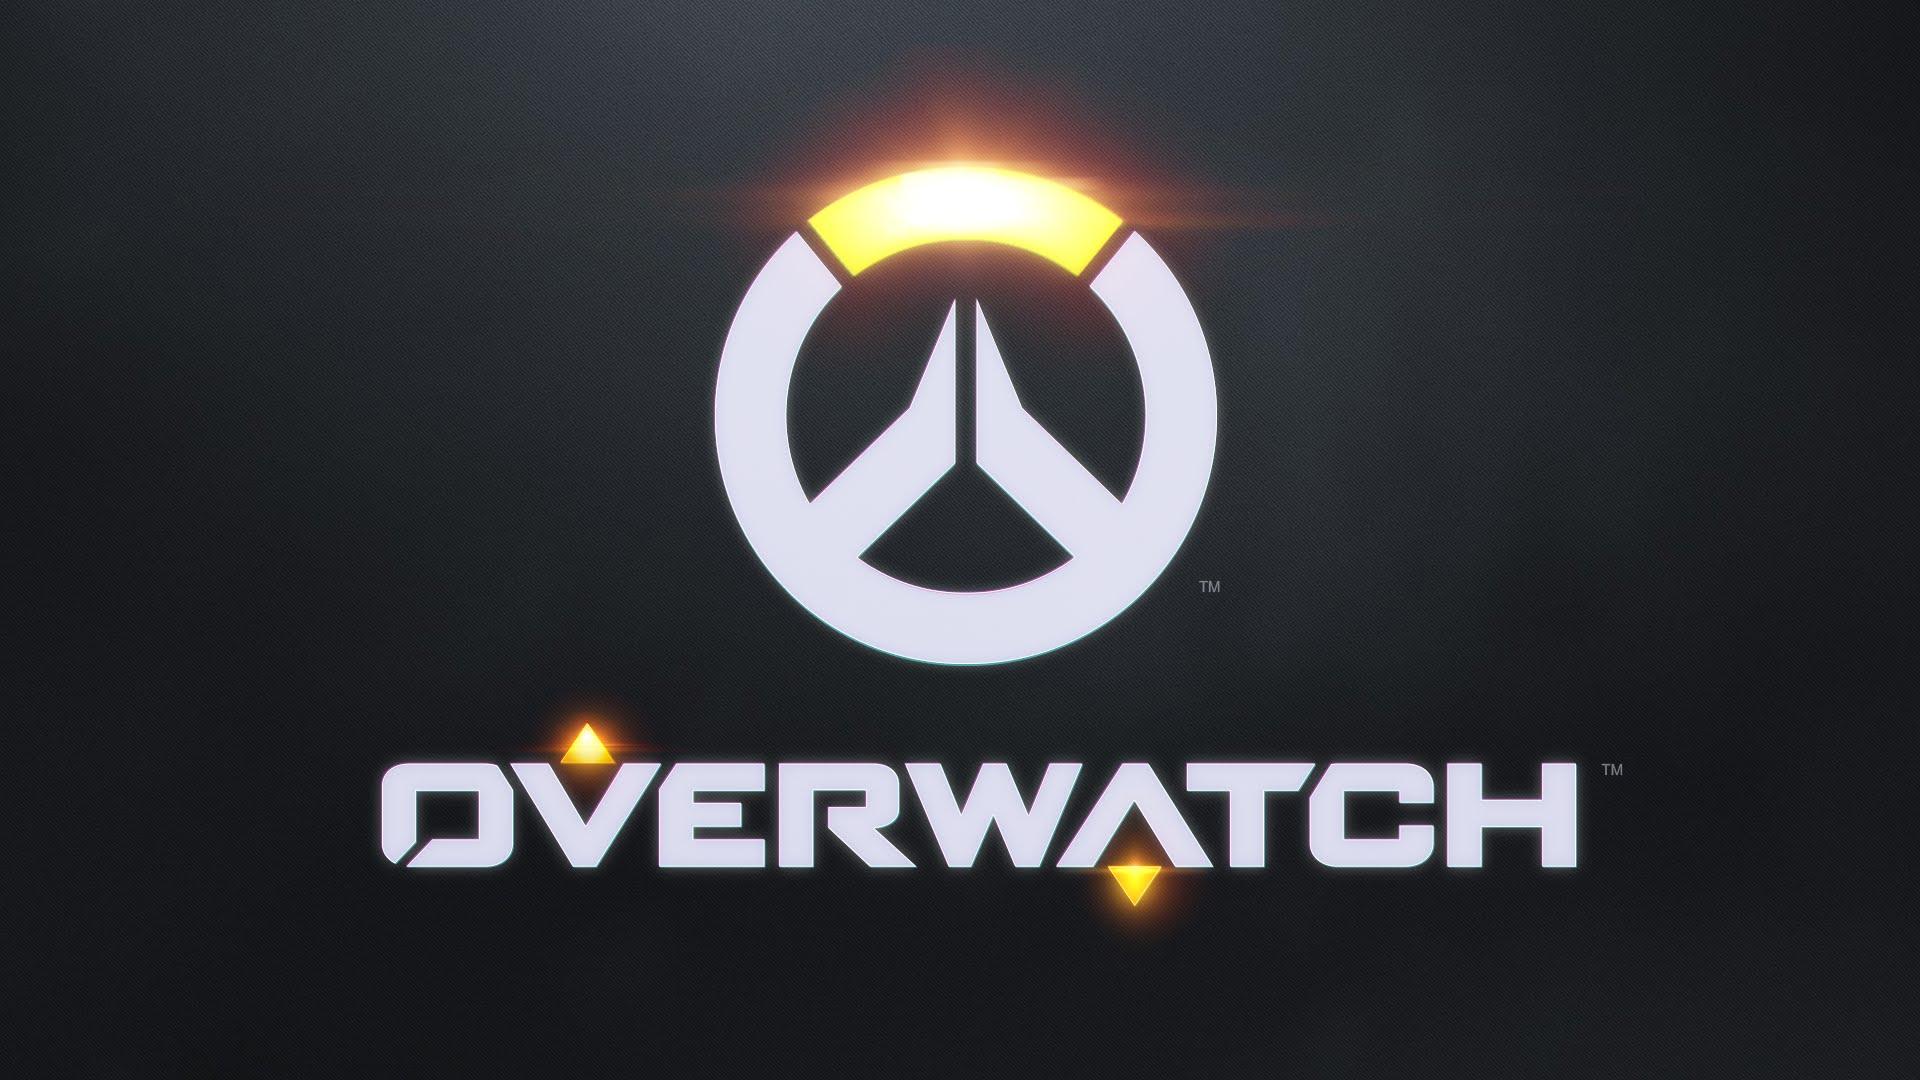 Blizzardが新作『Overwatch』を発表!チームベースのマルチプレイシューター